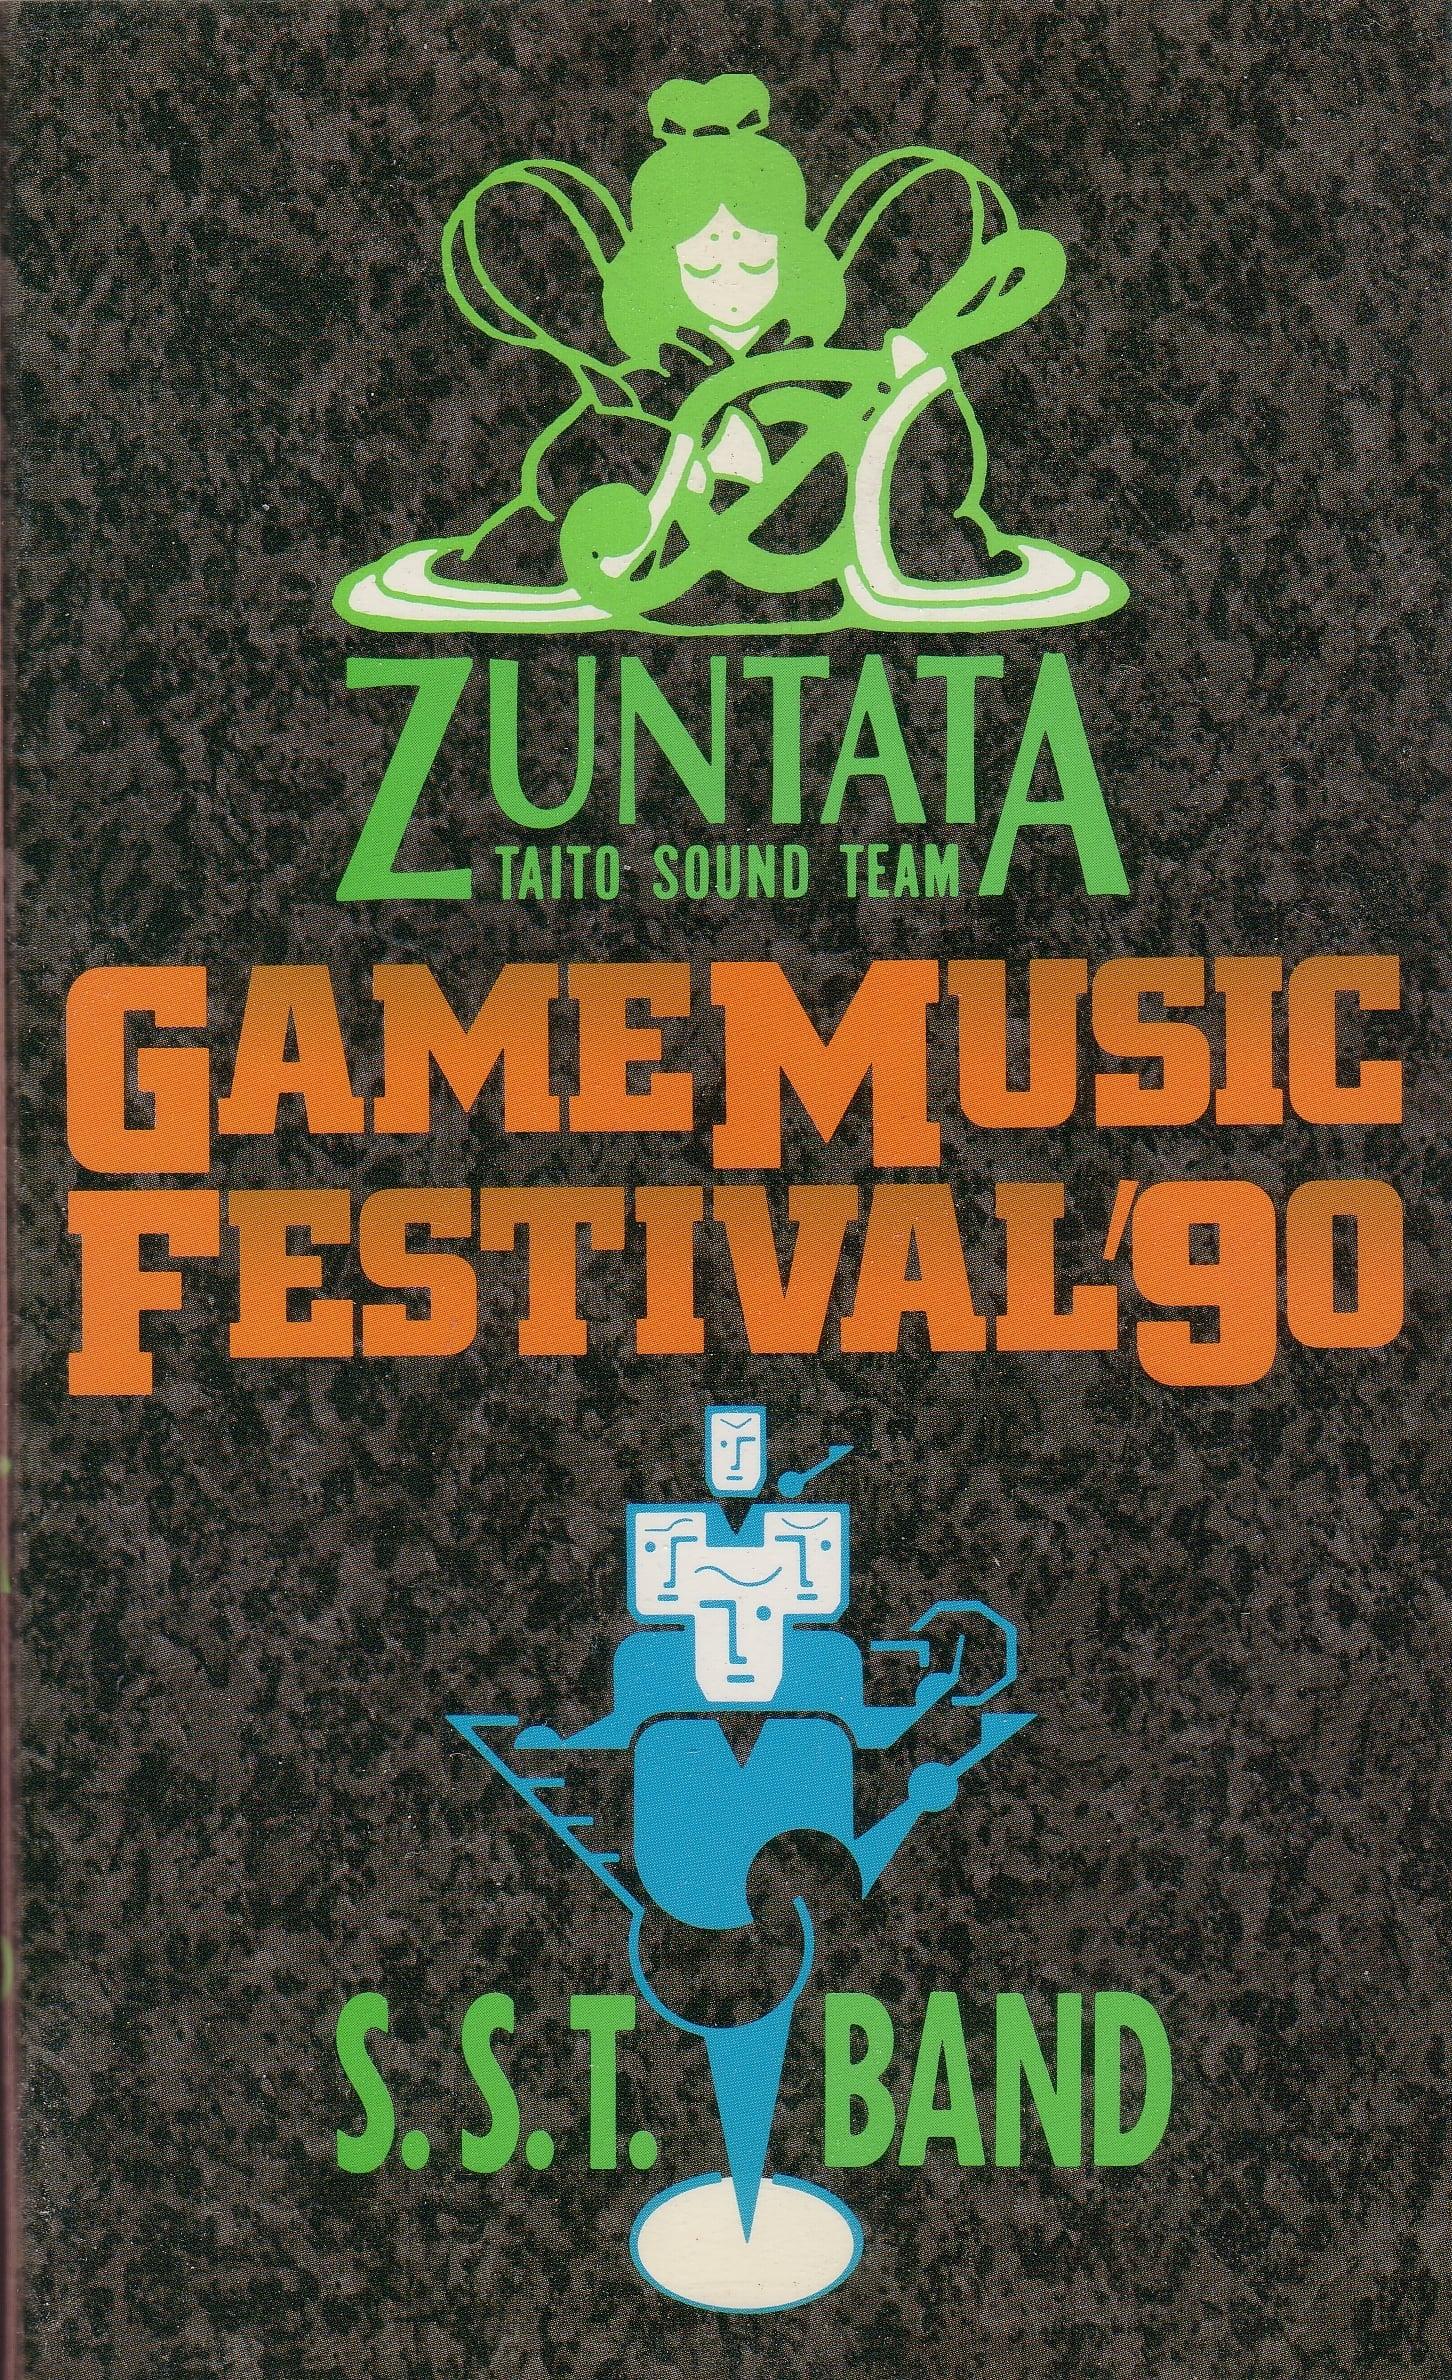 Game Music Festival Live '90: Zuntata Vs. S.S.T. Band